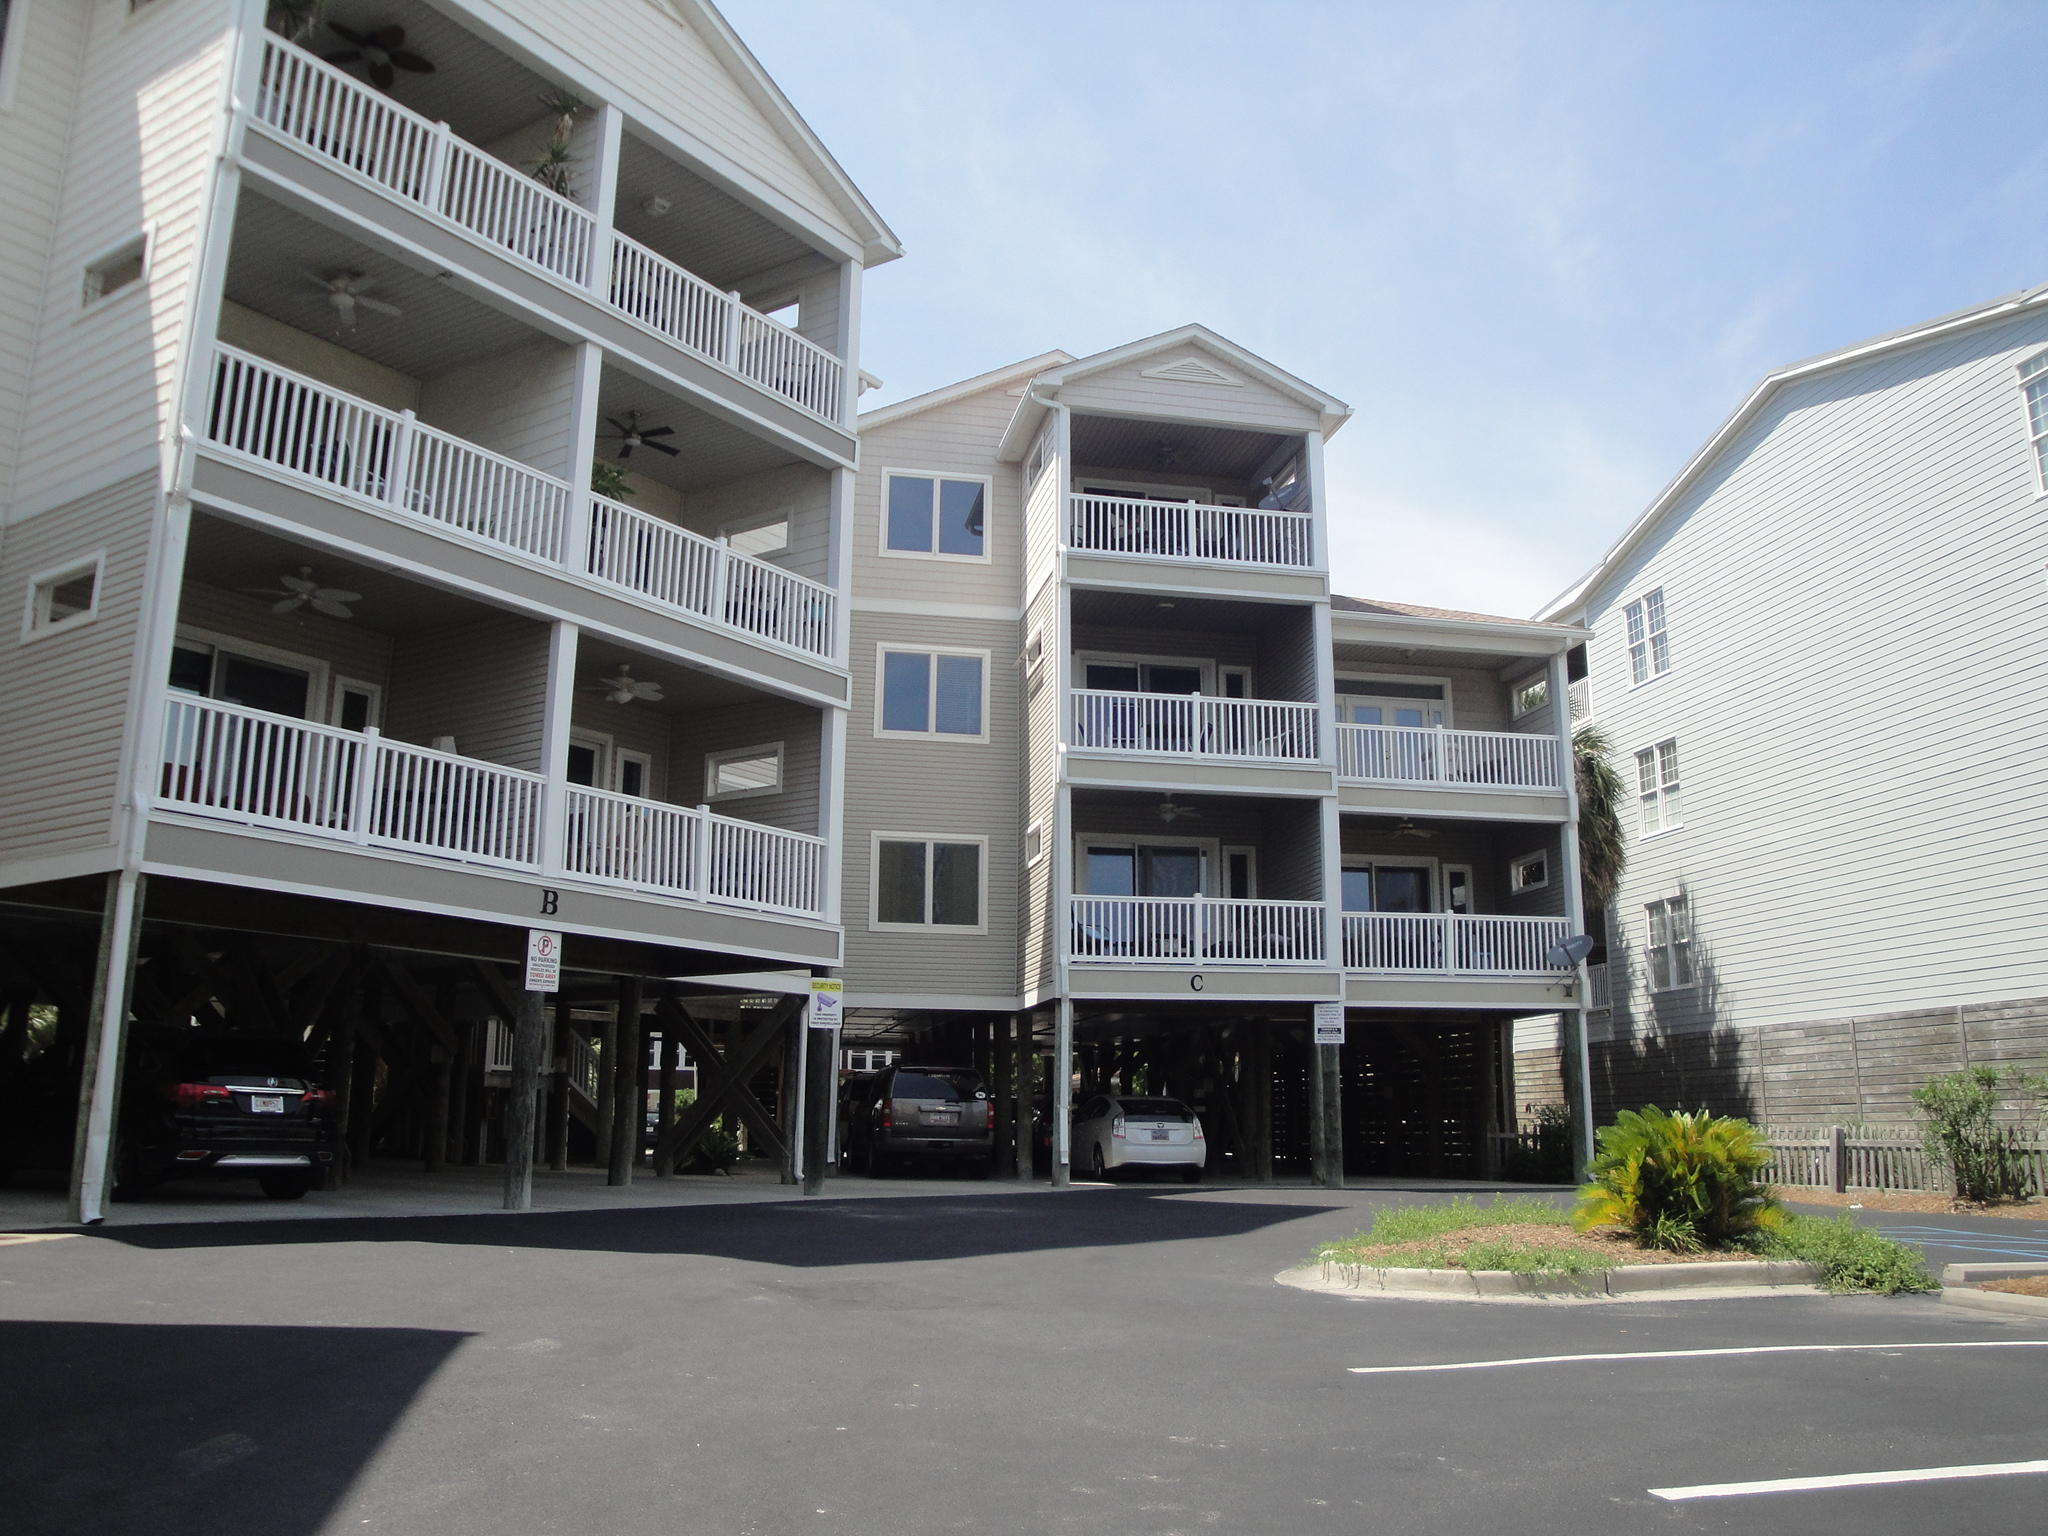 Pier Pointe Villas Homes For Sale - 117 Ashley, Folly Beach, SC - 21